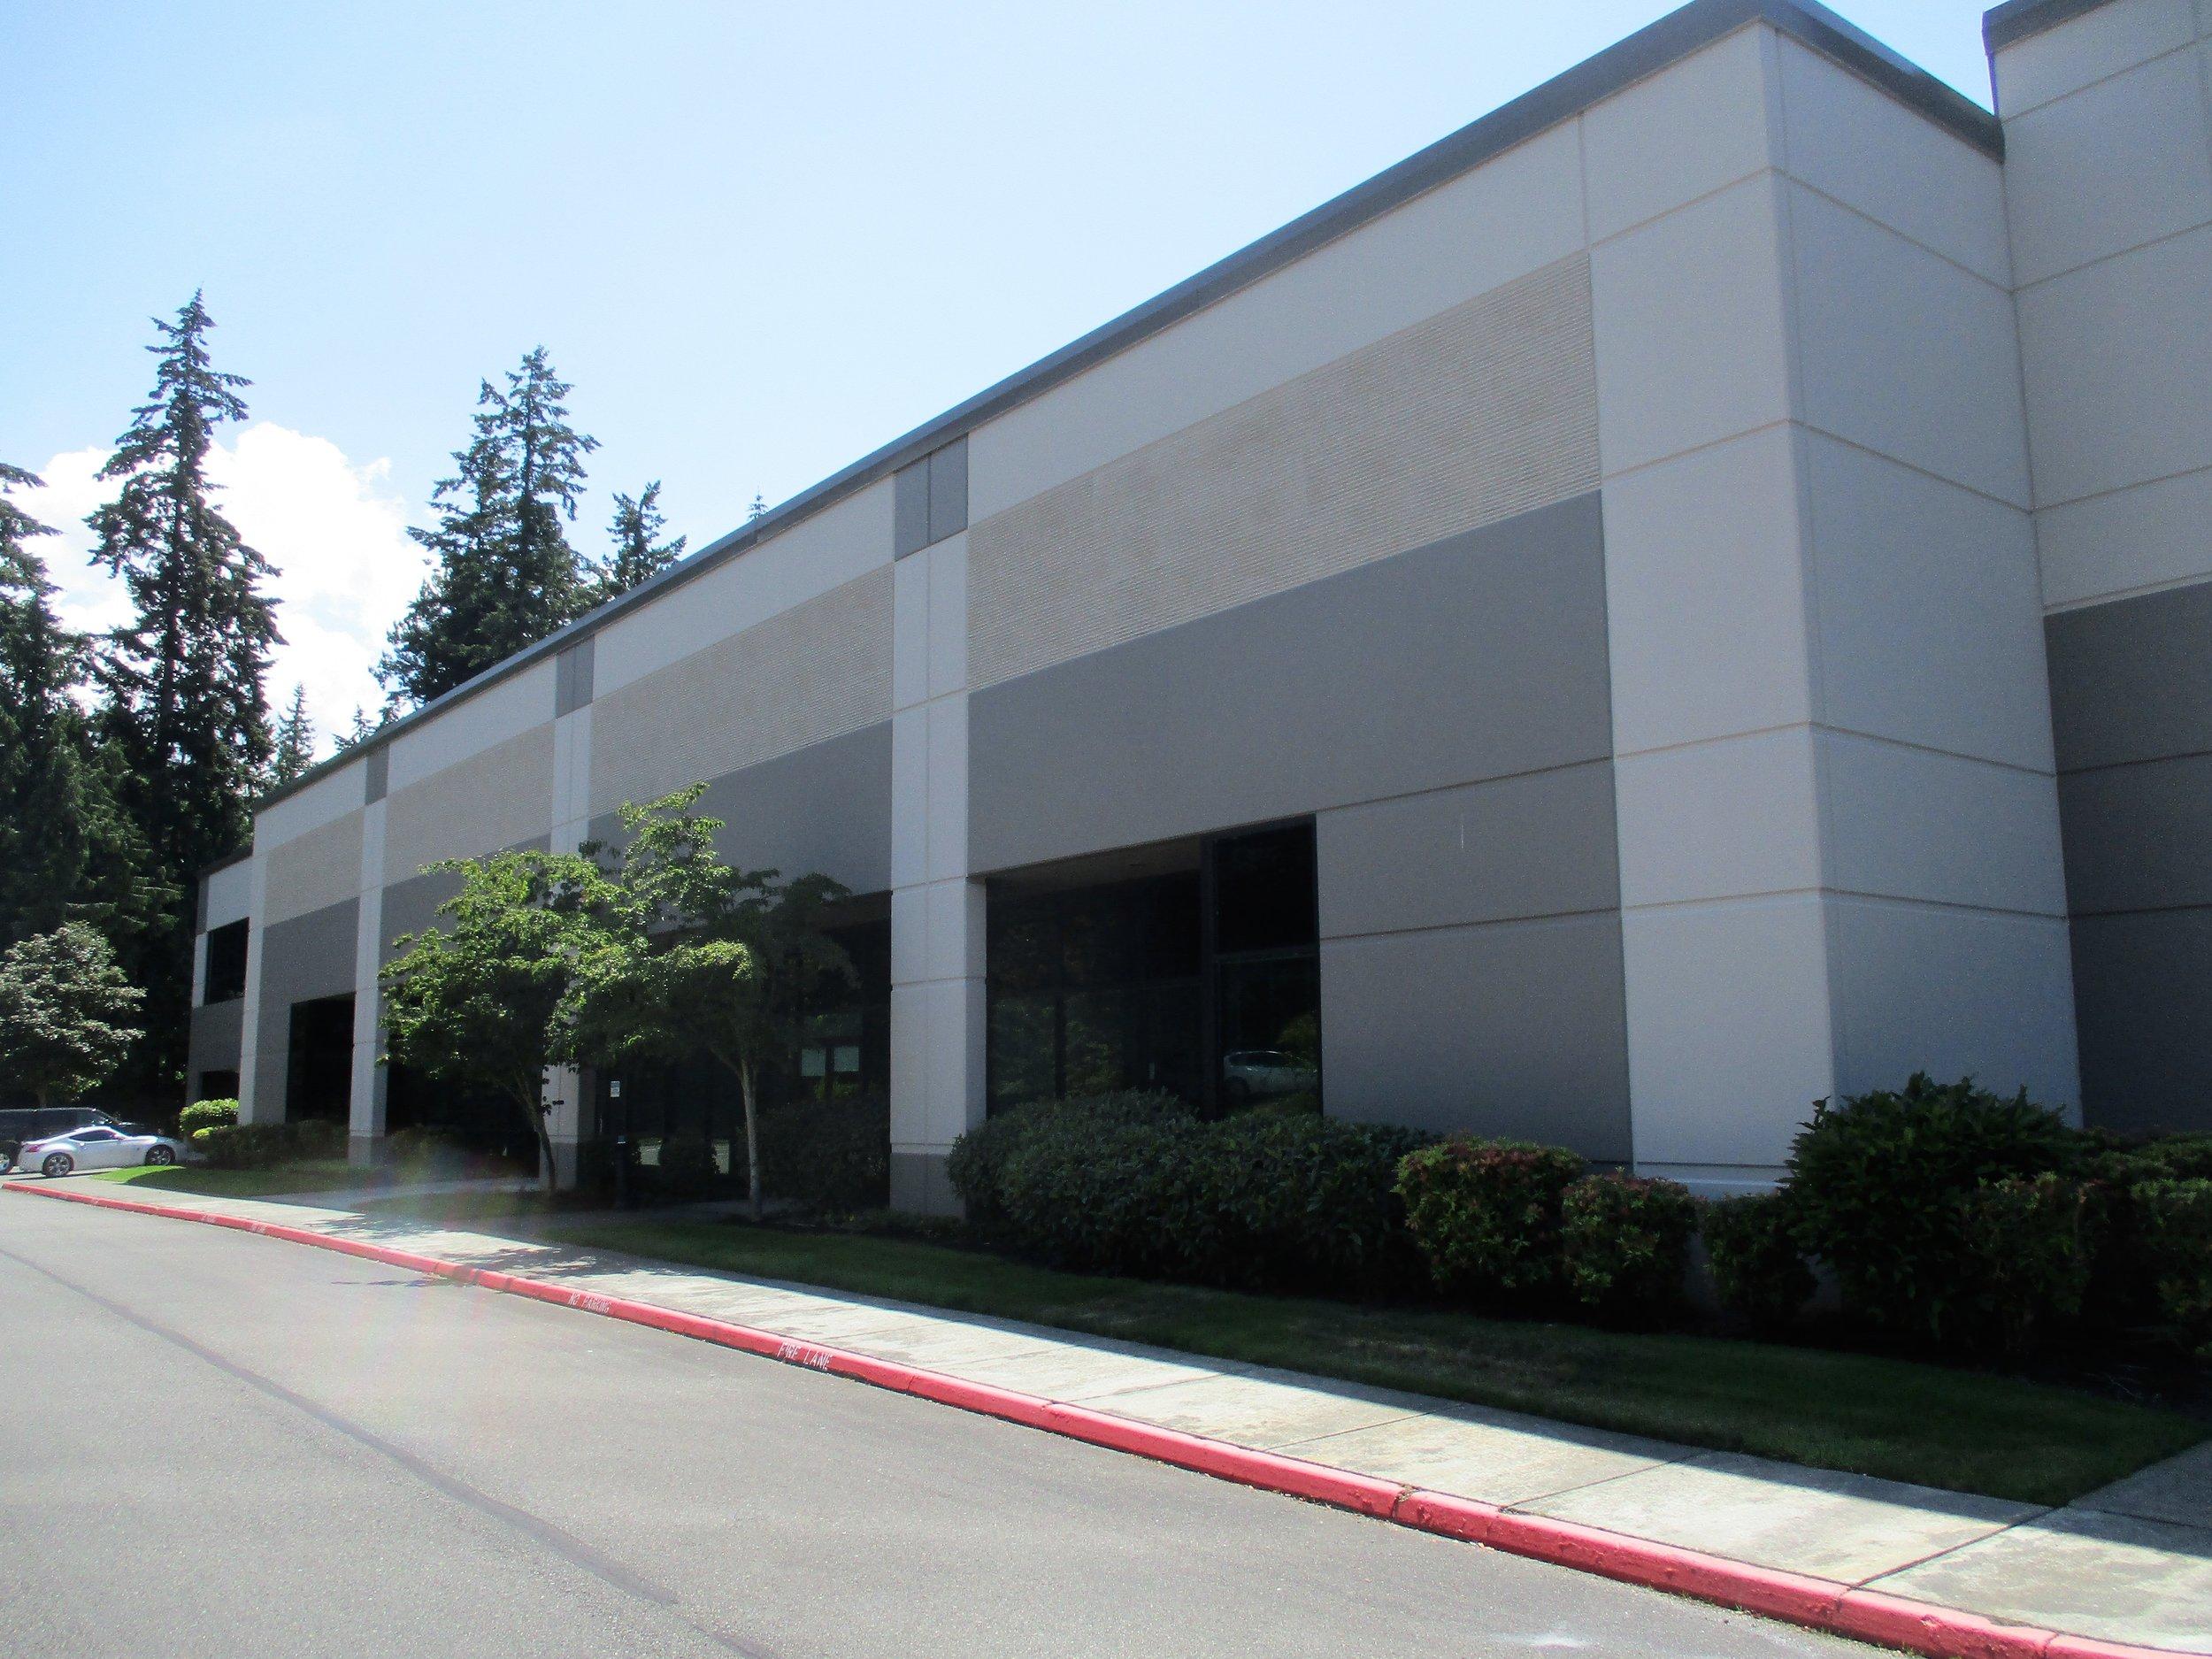 North Campus Building - 12125 Harbour Reach Dr, Mukilteo WA 98275